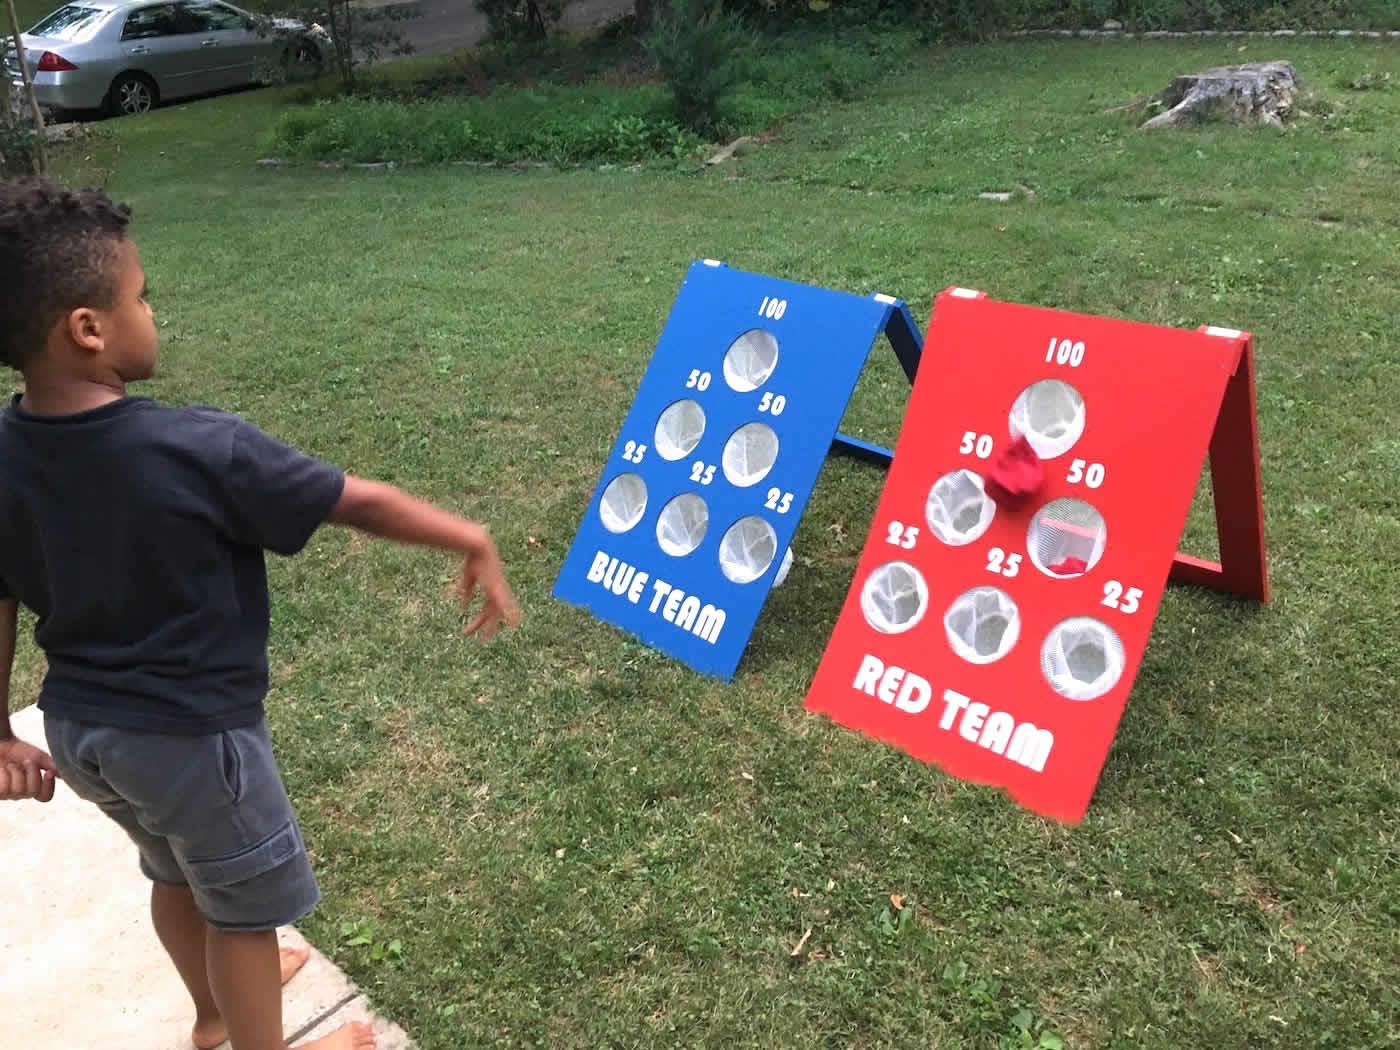 Backyard Bean Bag Toss Game